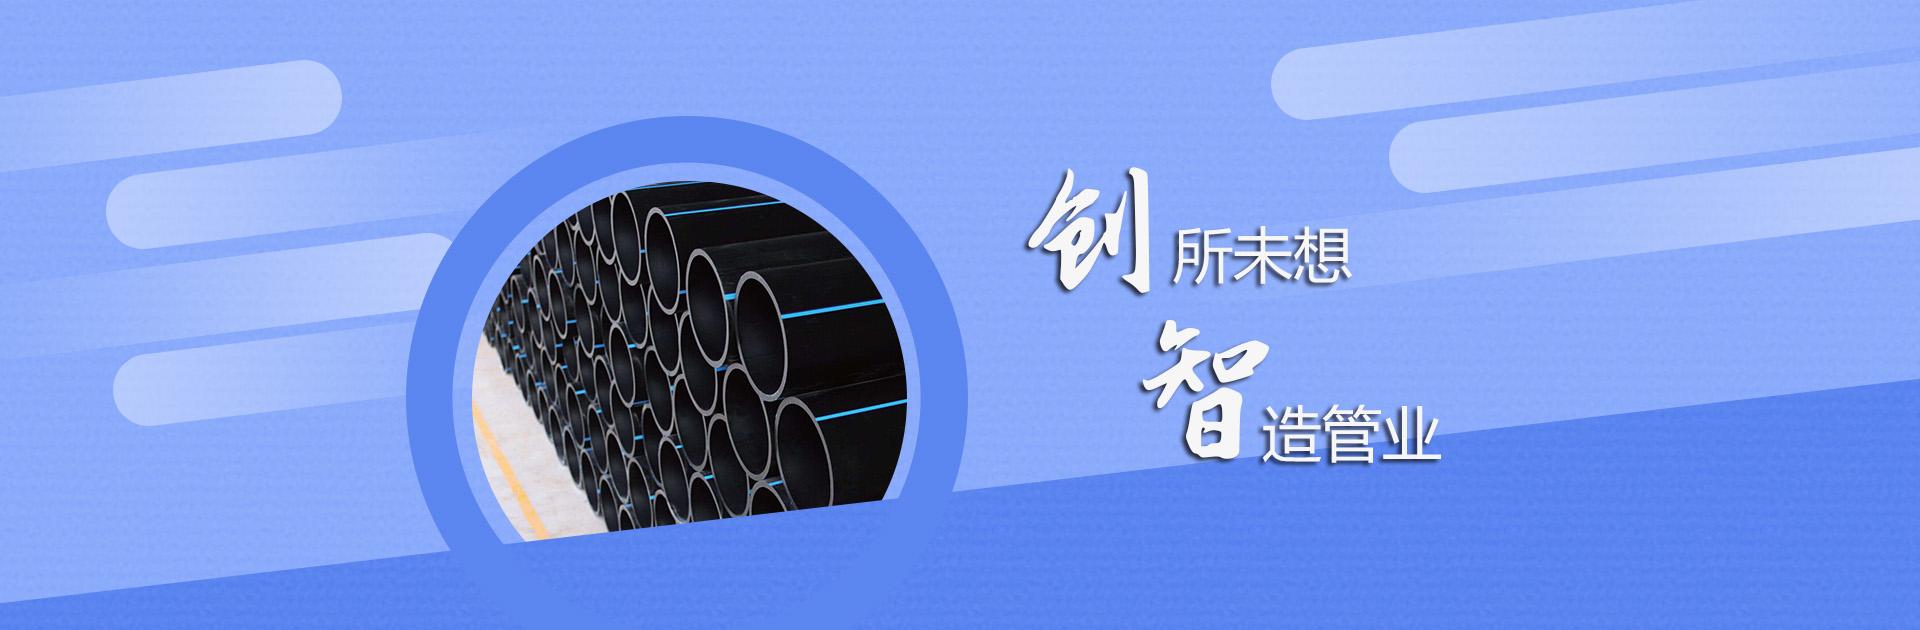 PEgei水管材管件